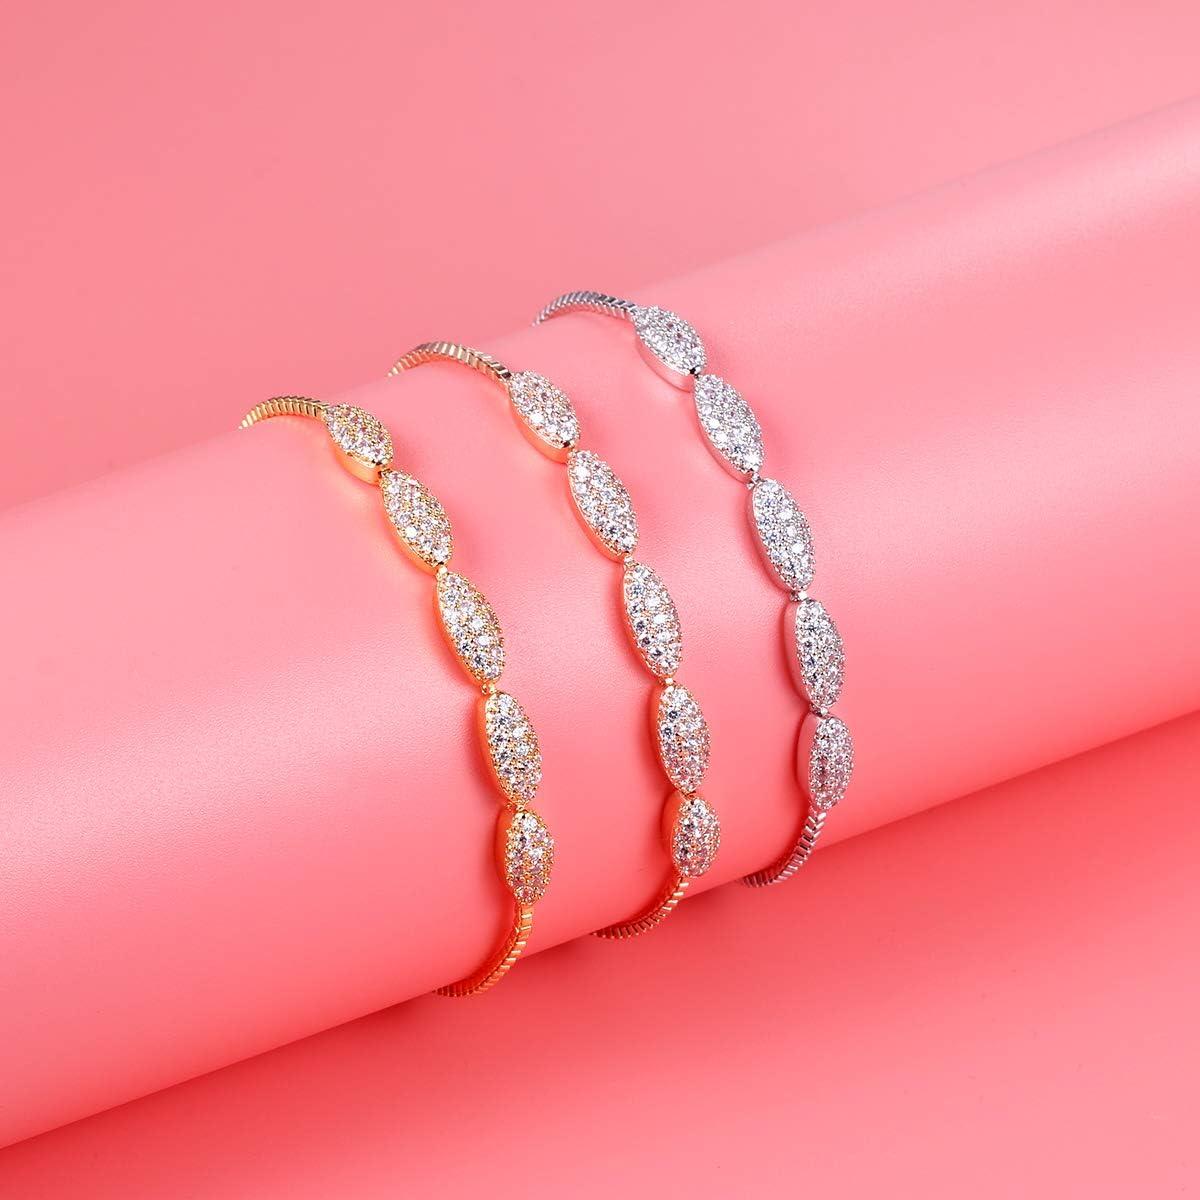 WeimanJewelry Shiny Cubic Zirconia Oval Shape Adjustable CZ Marquise Bridal Bracelet for Women Wedding